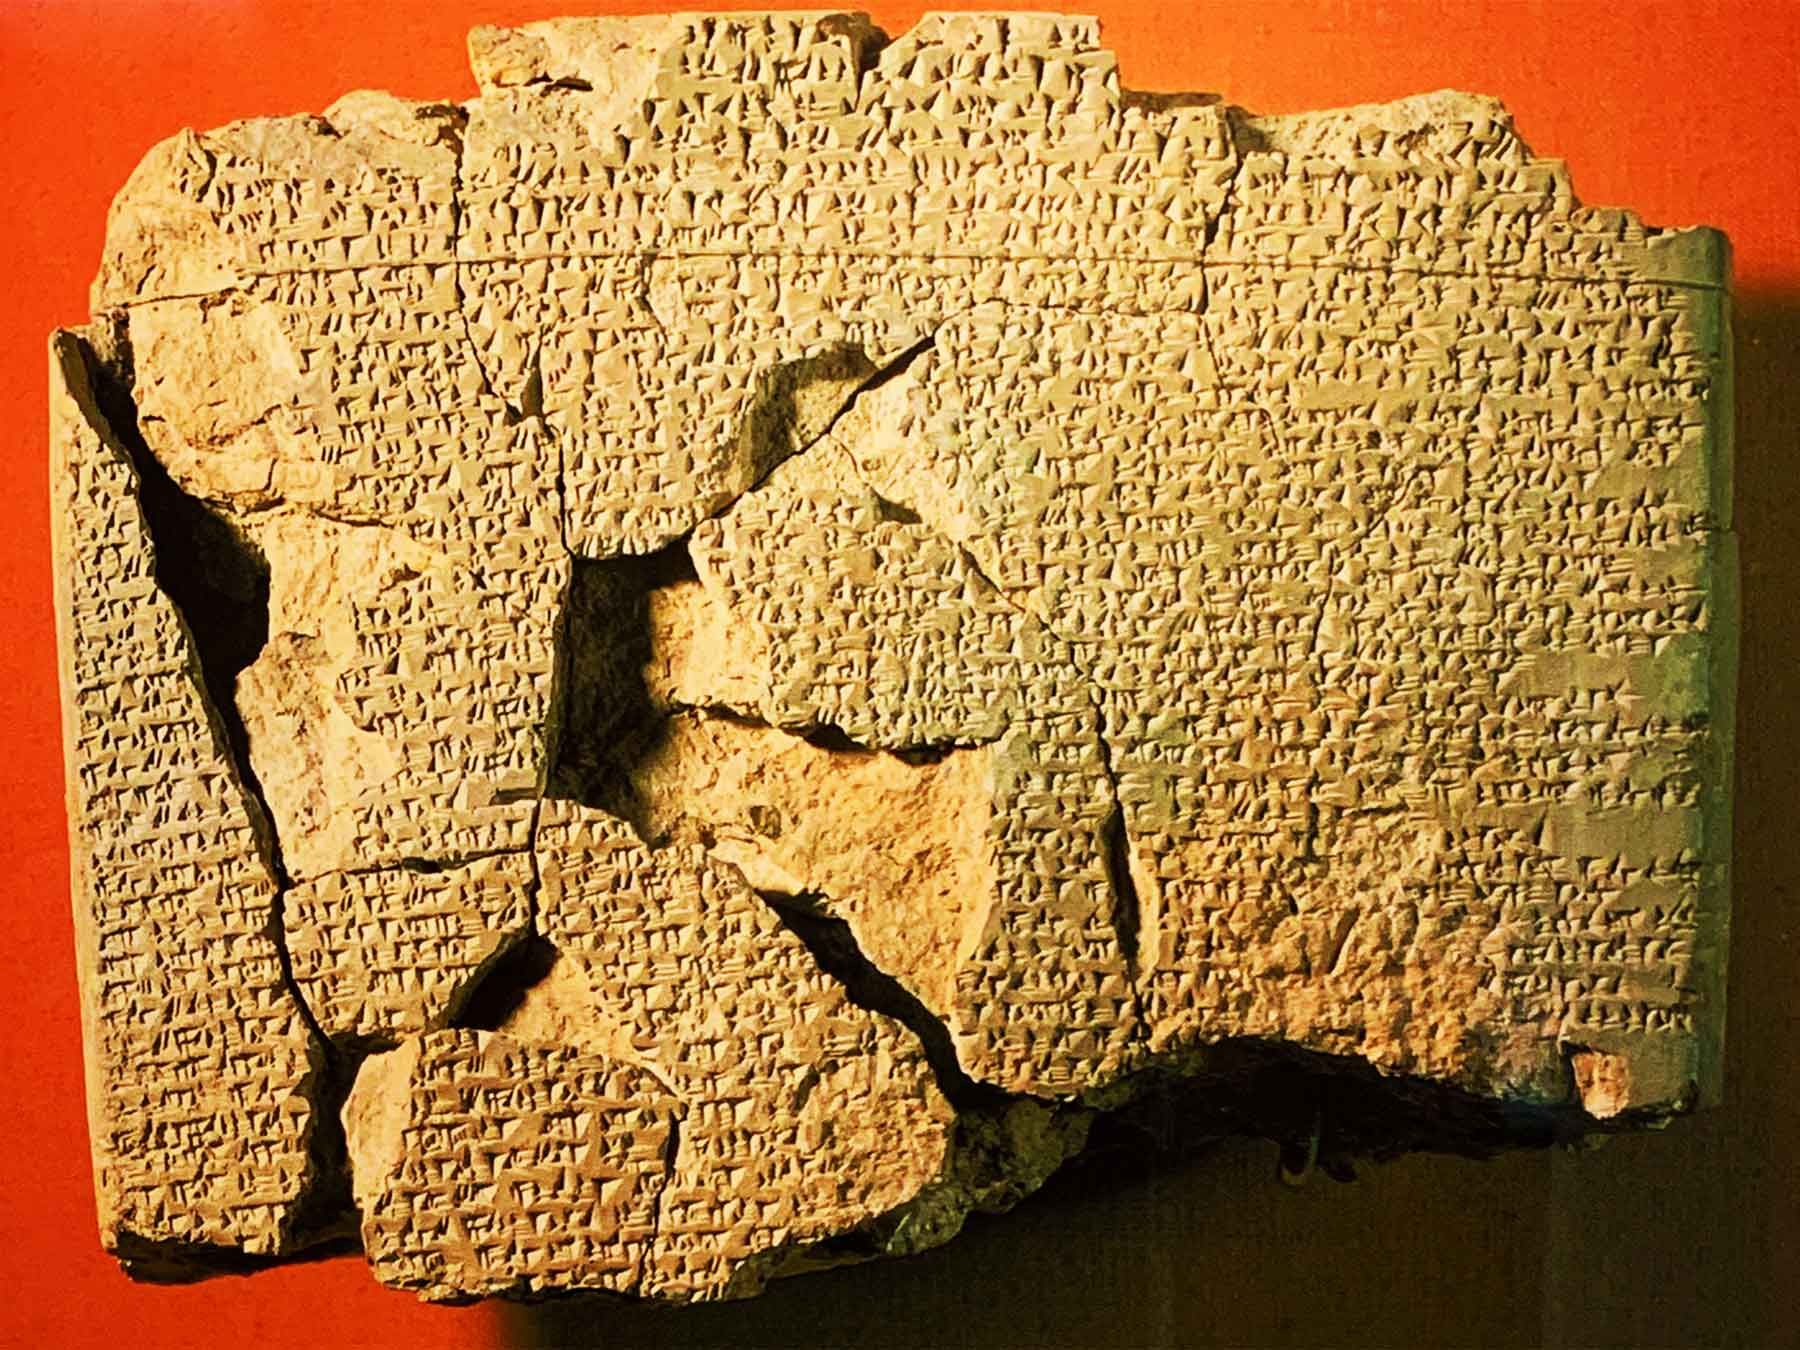 Hittite Peace Treaty of Kadesh | Egyptian - Hittite Peace Treaty 1259 BCE | Hattusa Turkey | Istanbul Archaeological Museums | Professor Steven Andrew Martin